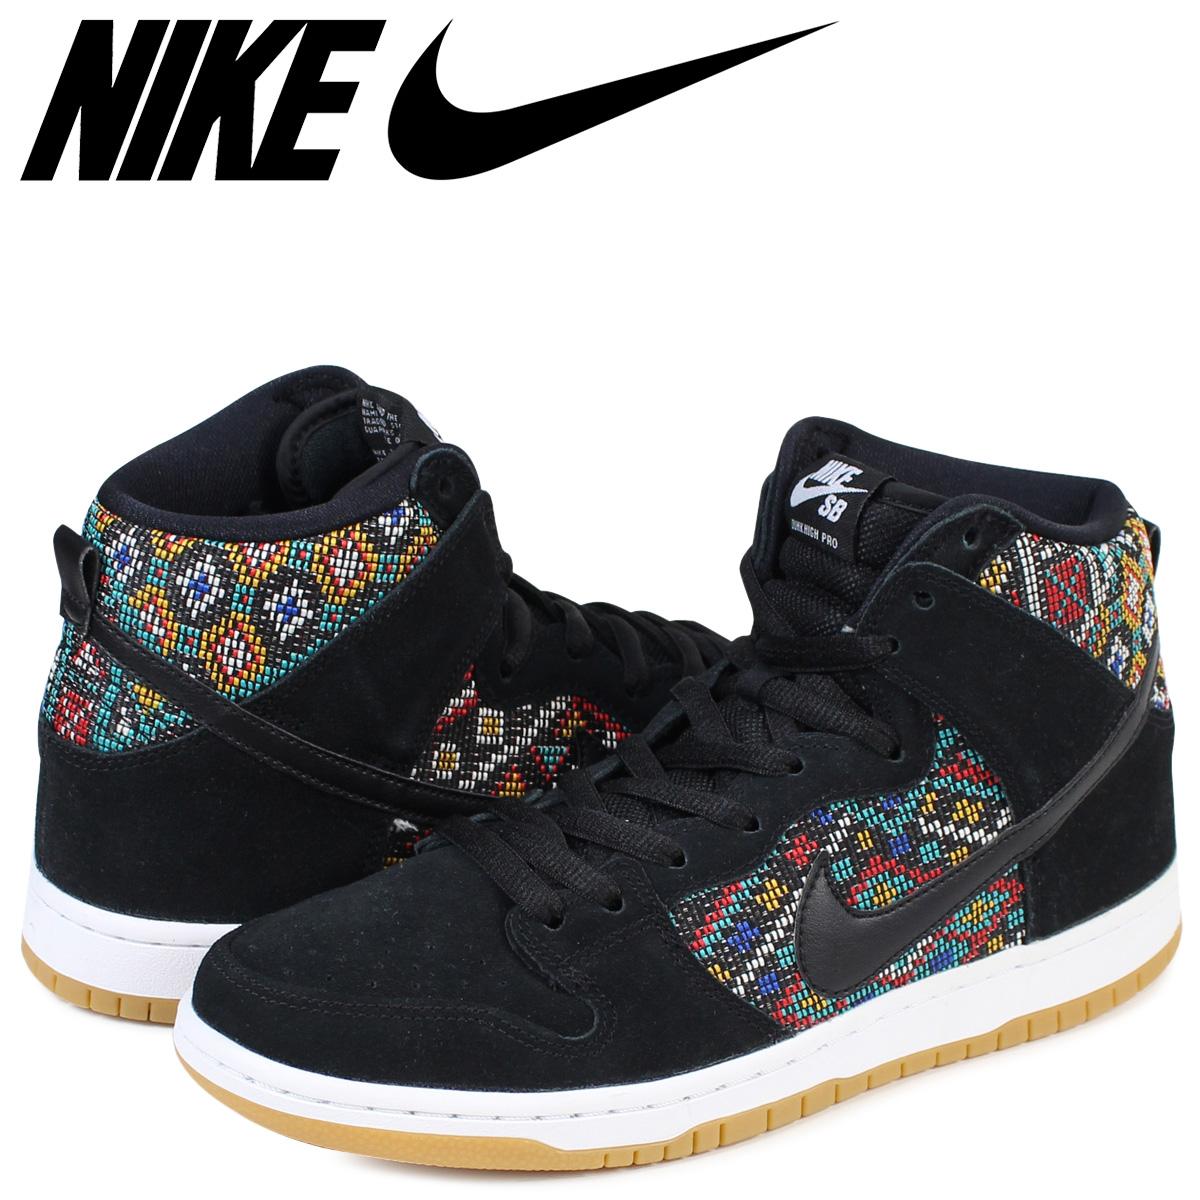 NIKE Nike SB dunk high sneakers DUNK HIGH PREMIUM SEAT COVER 313,171 030 men's black black